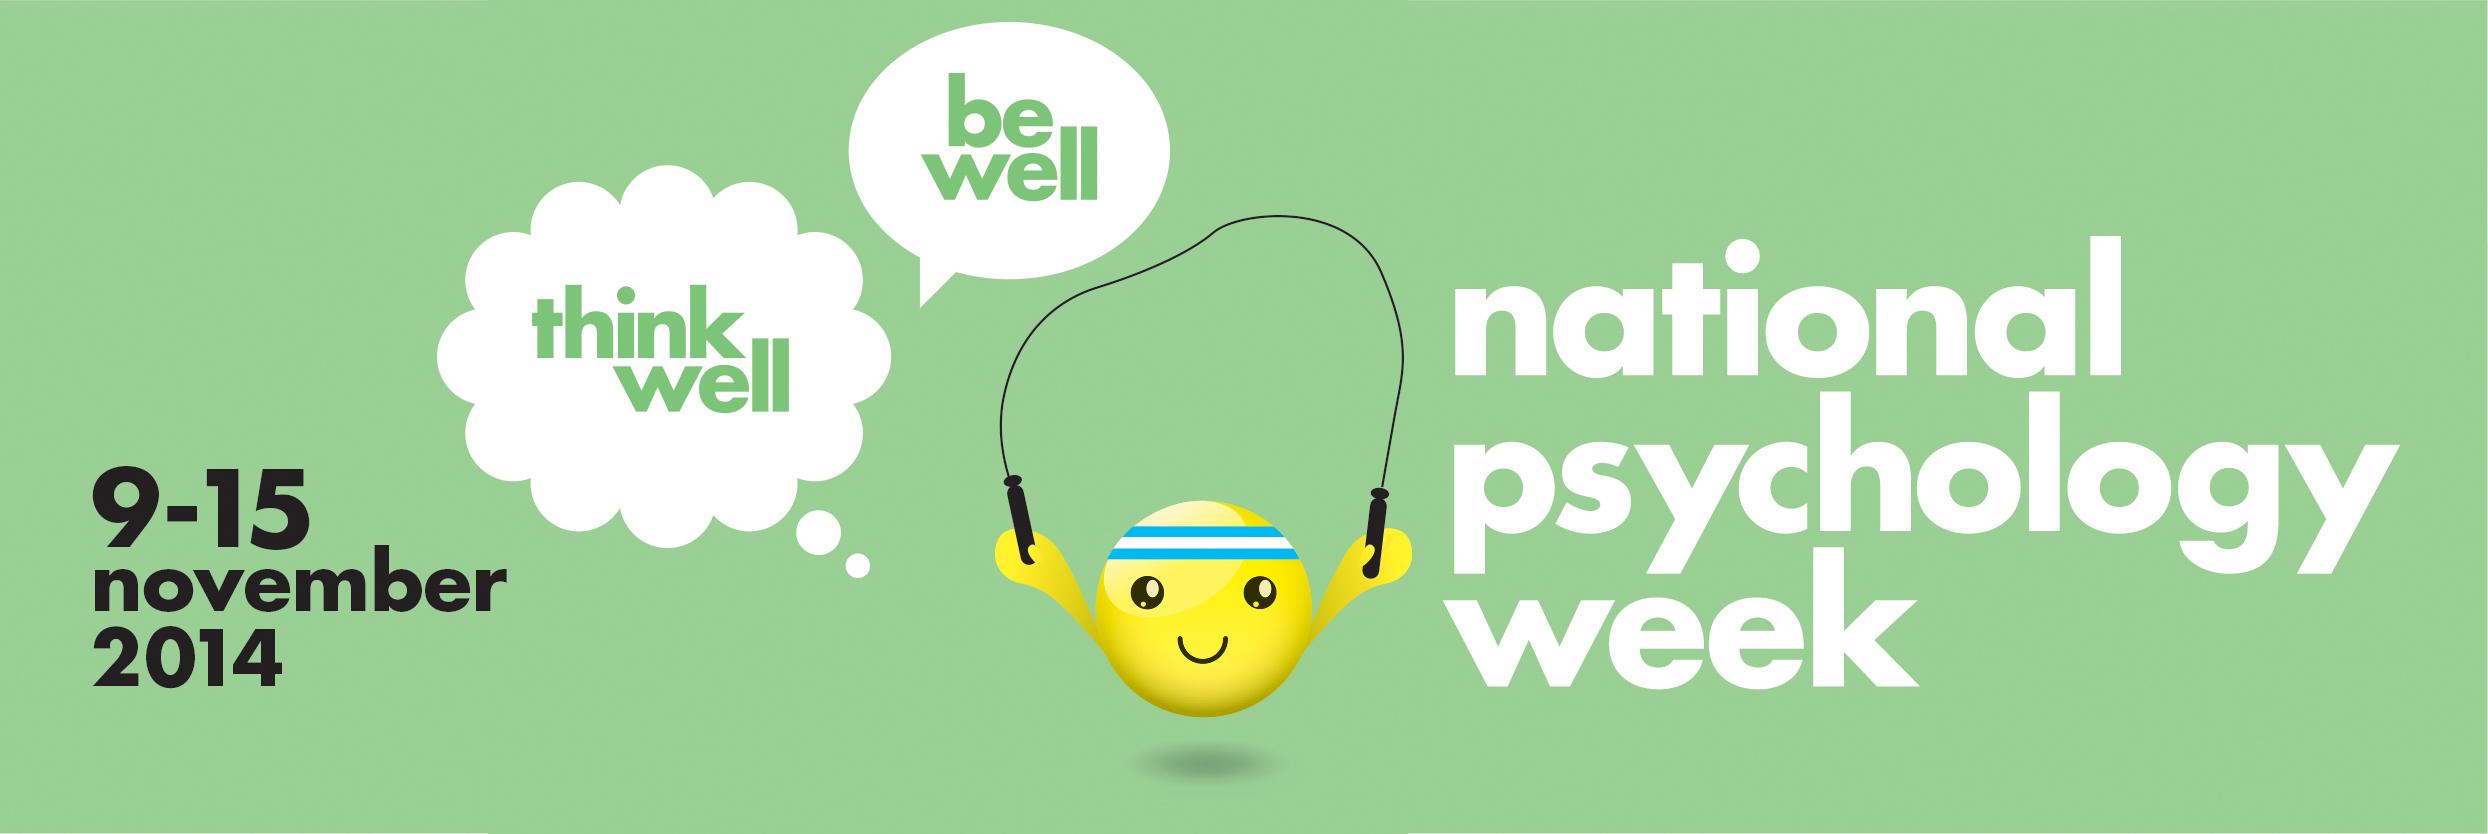 national psychology week potential psychology blog